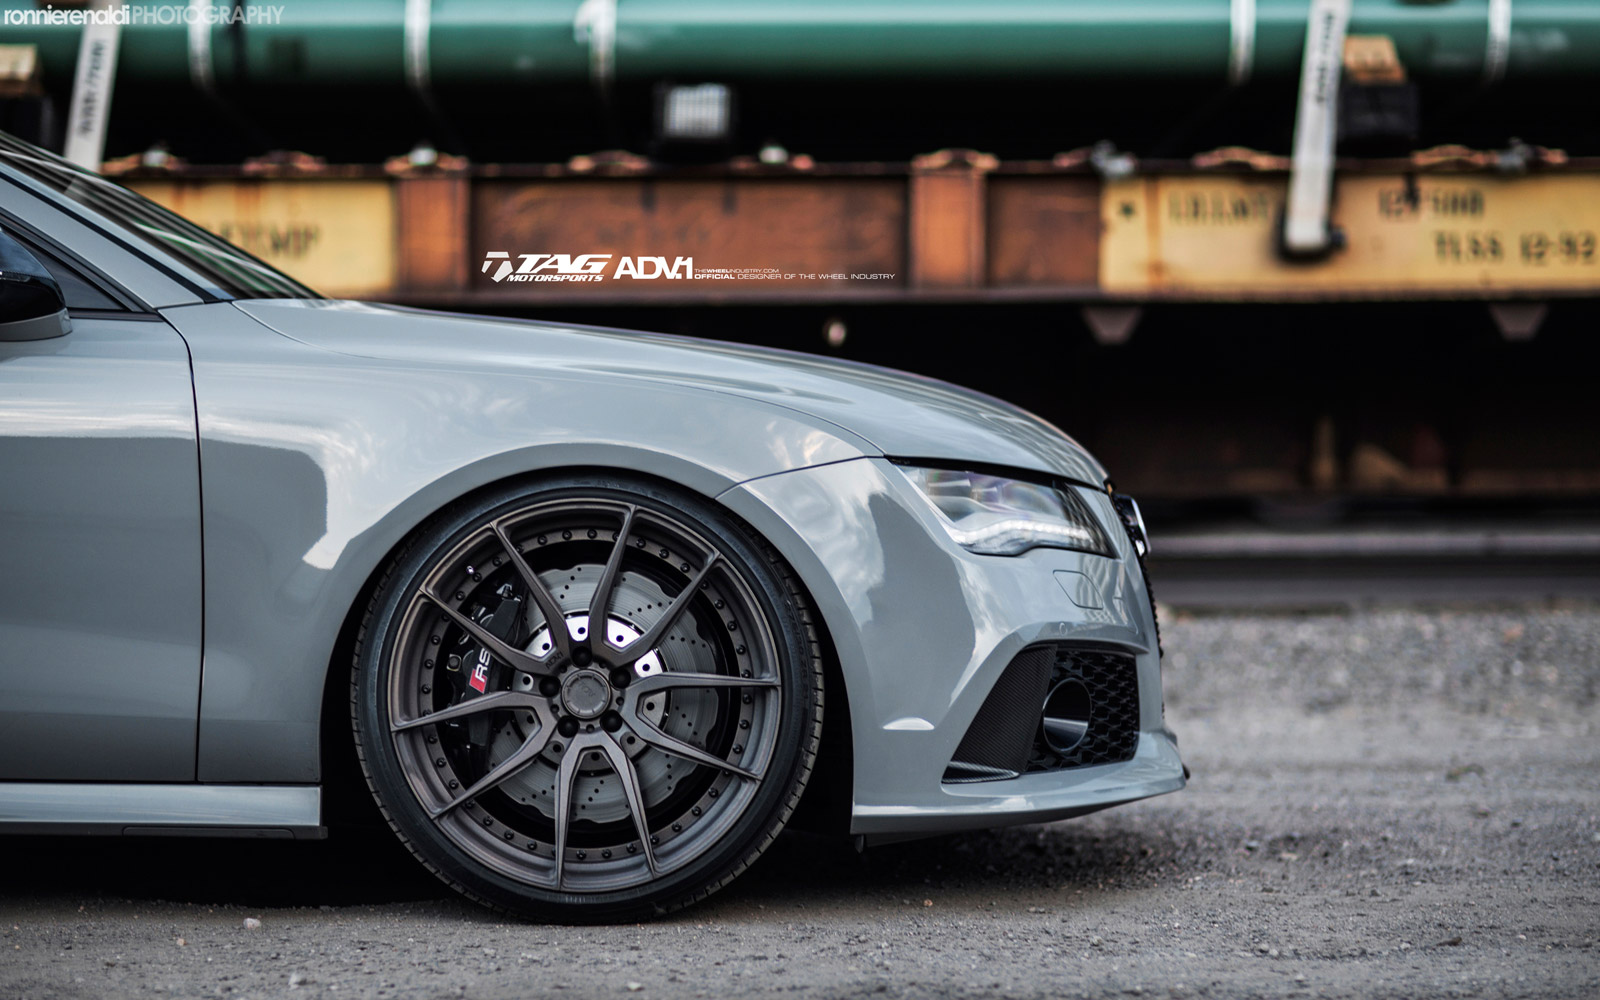 Audi Rs7 Grey Battle Ship By Adv1 Automotive Tuner